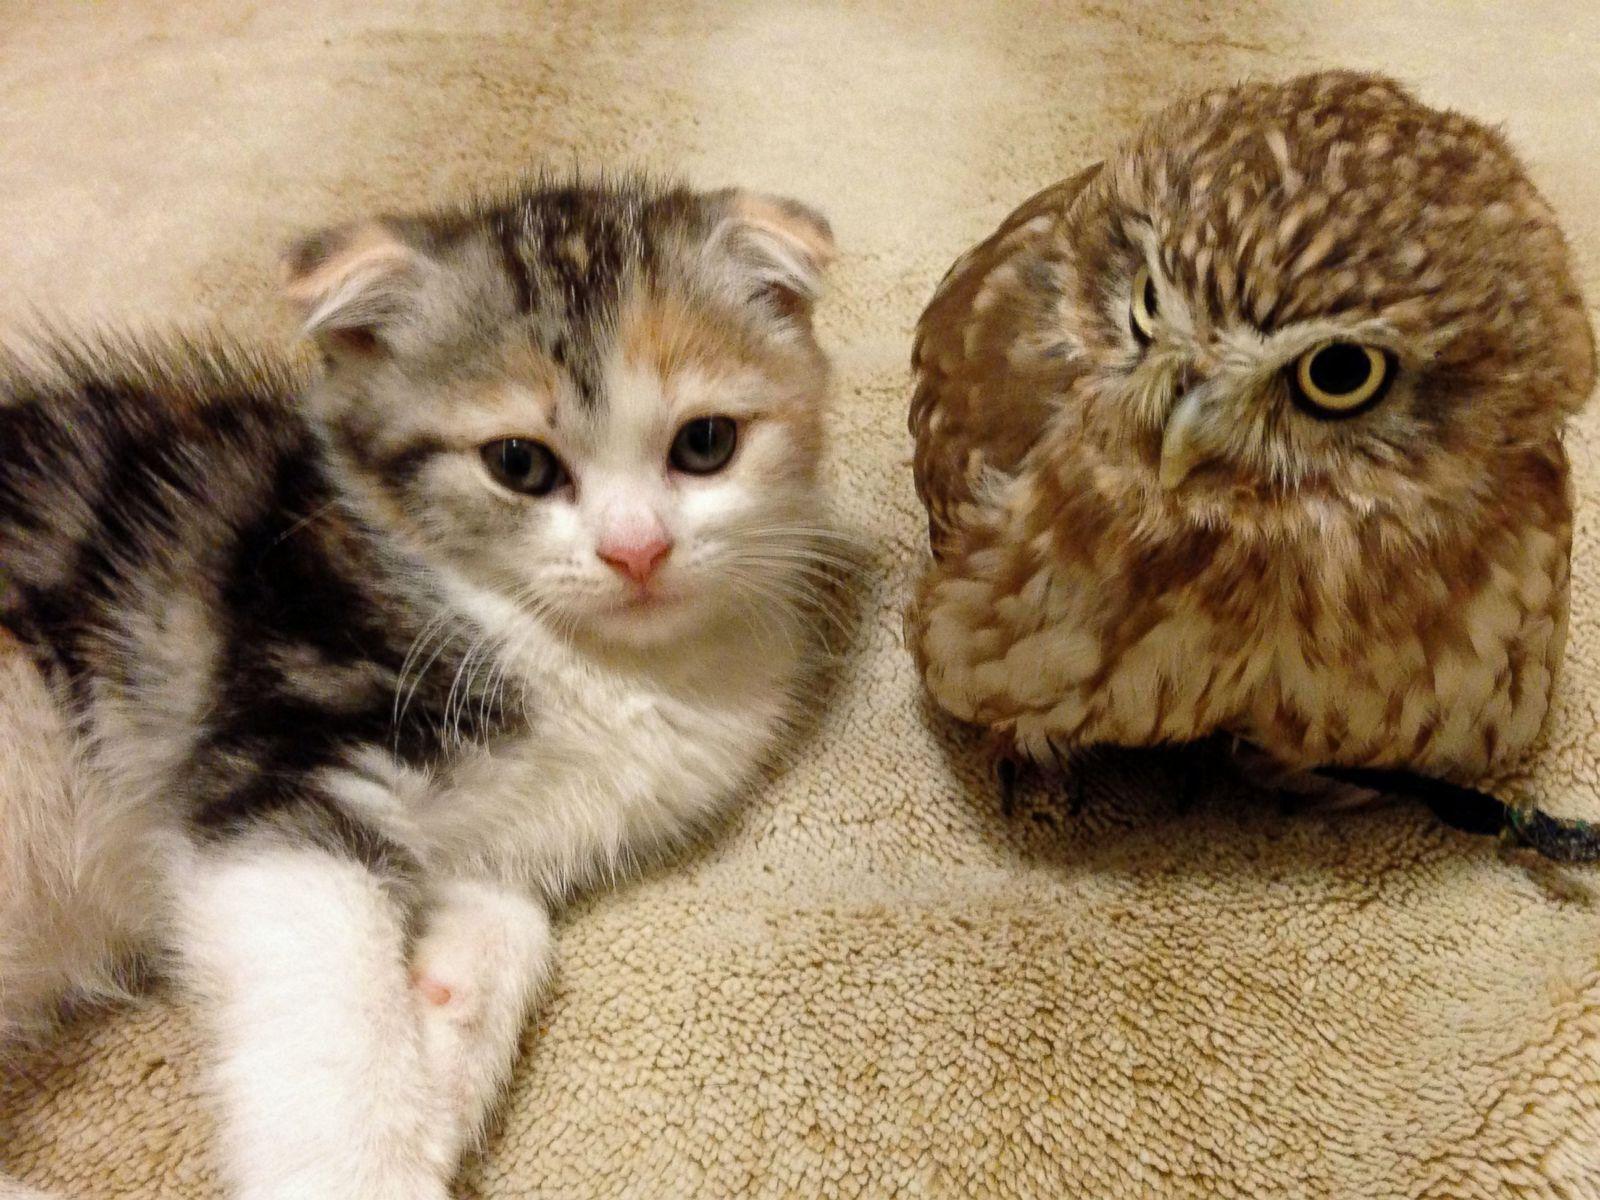 Cat And Owl Friends Http Ift Tt 2ofppco Cats Baby Animals Cat Photo